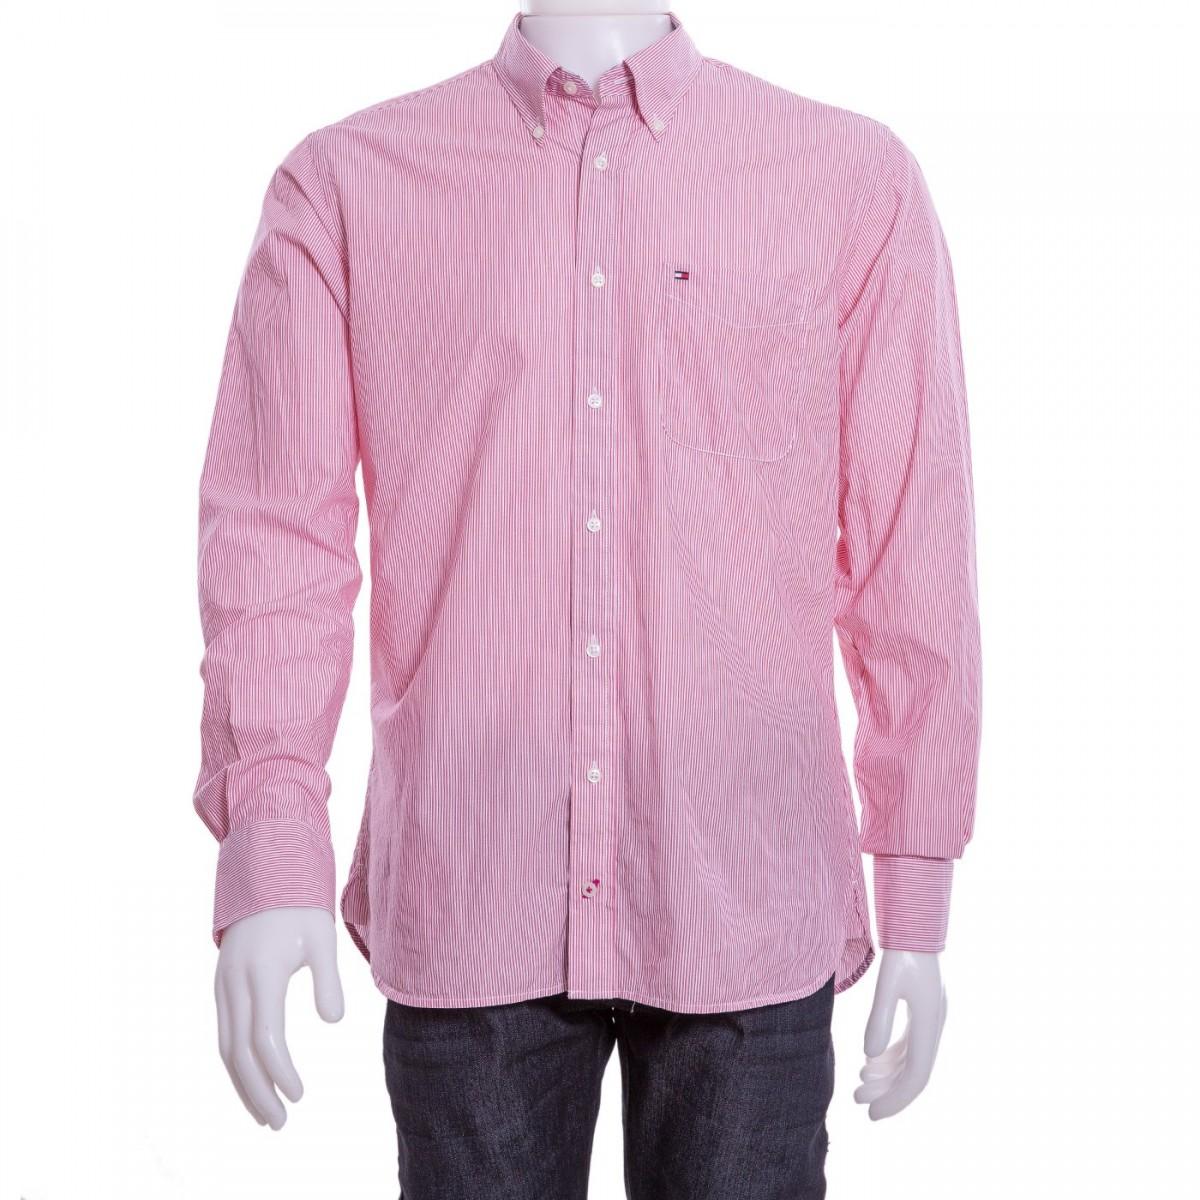 51e007d6abd Bizz Store - Camisa Social Masculina Tommy Hilfiger Manga Longa Fit